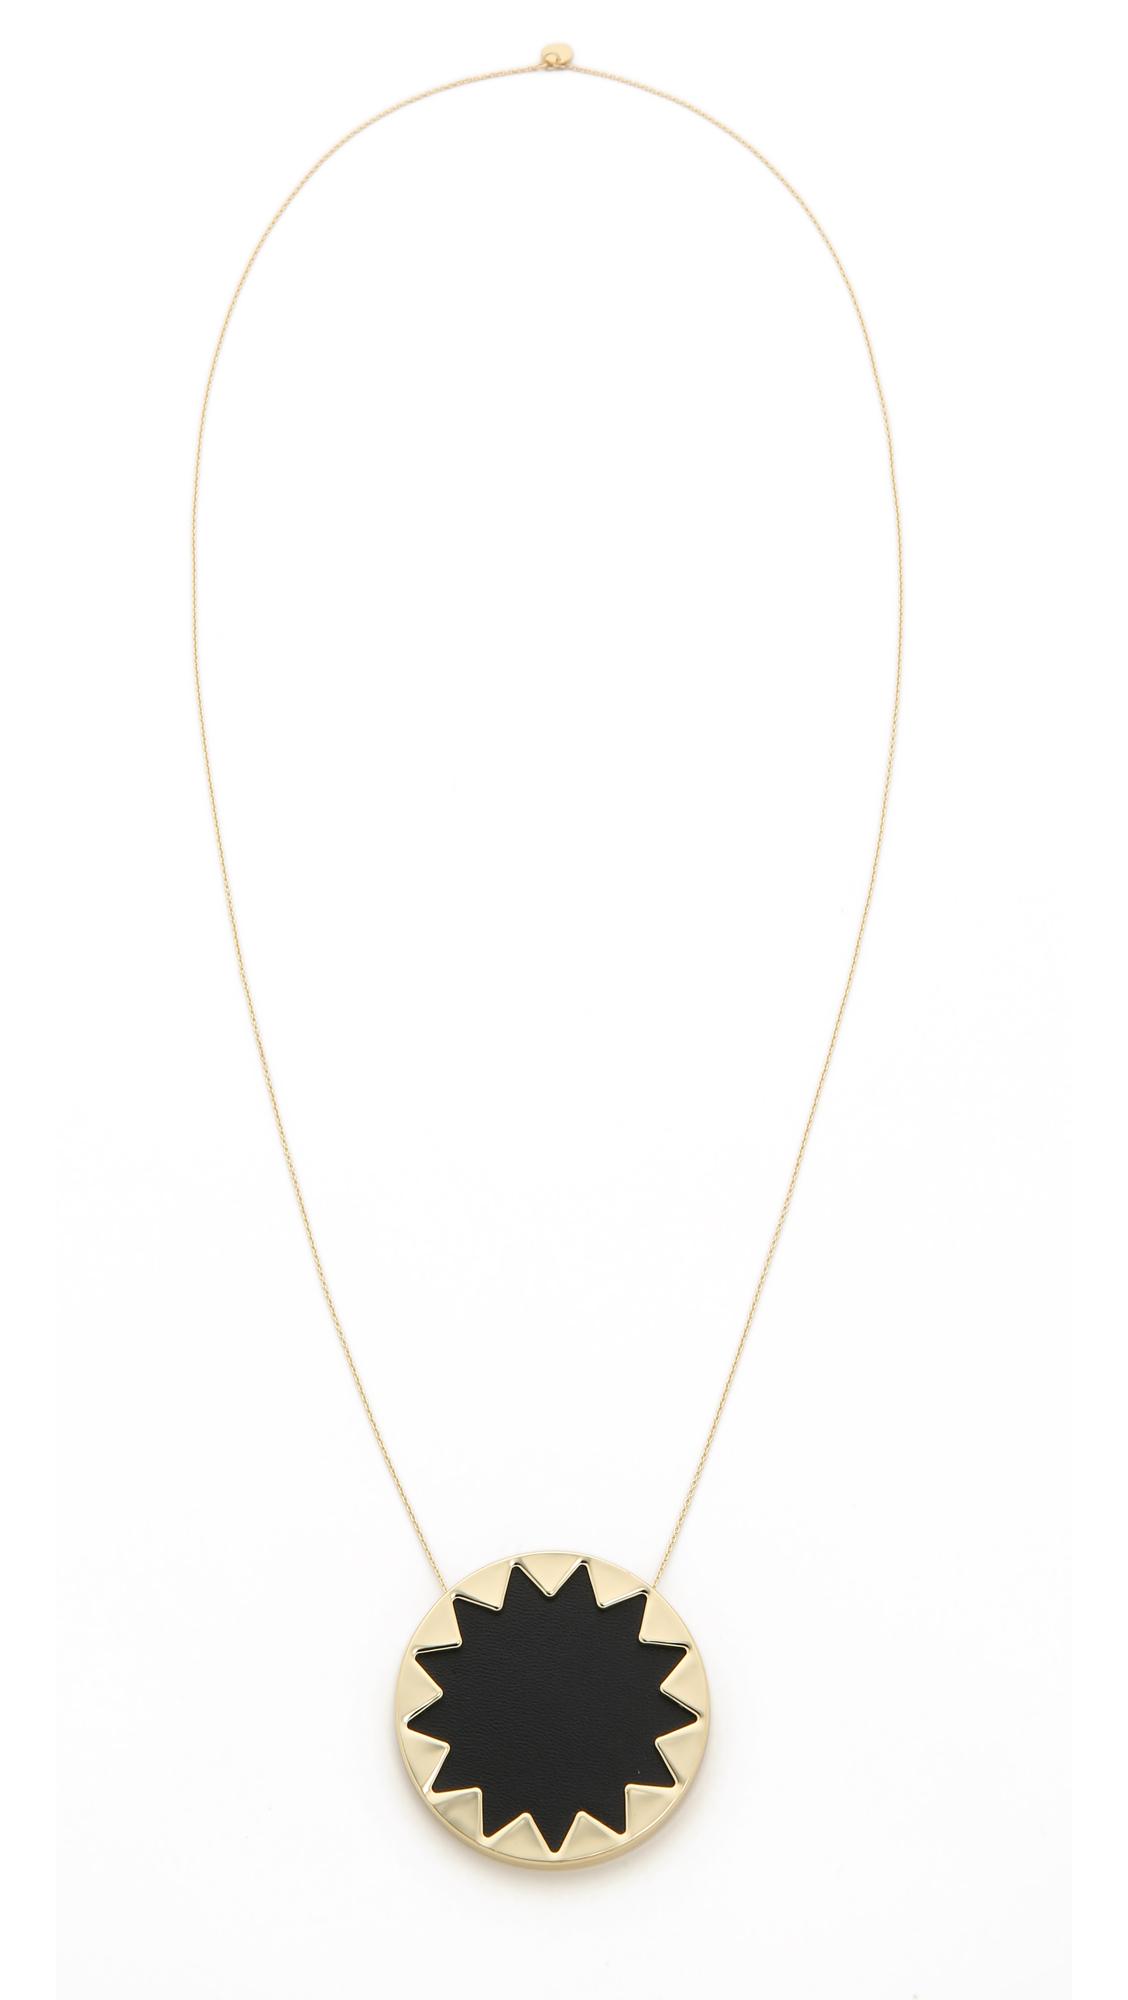 House of harlow 1960 sunburst pendant necklace shopbop mozeypictures Gallery